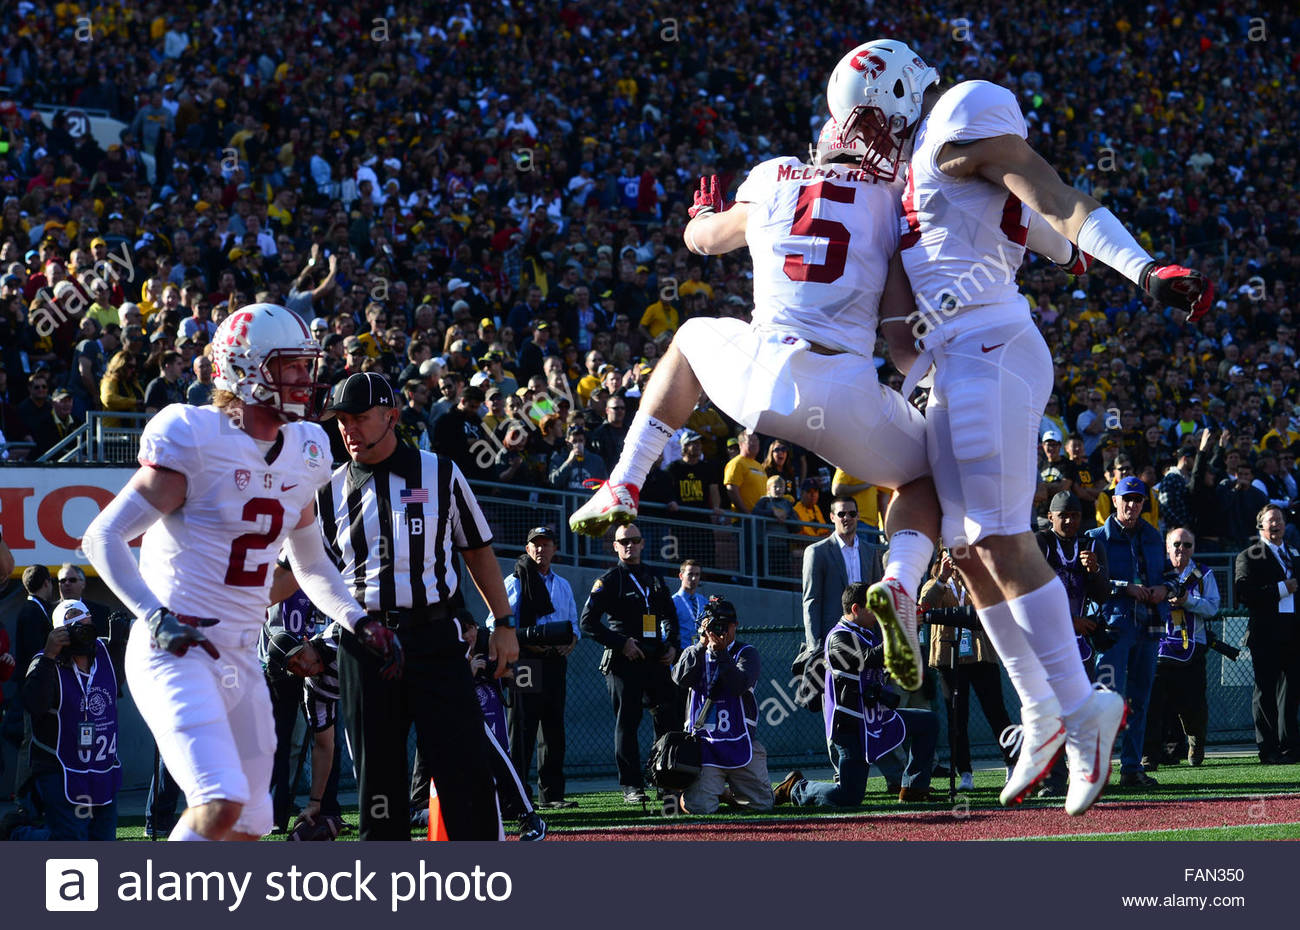 Pasadena, California, USA. 01st Jan, 2016. Stanford running back CHRISTAN MCCAFFREY (5) celebrates after a 75 yard Stock Photo